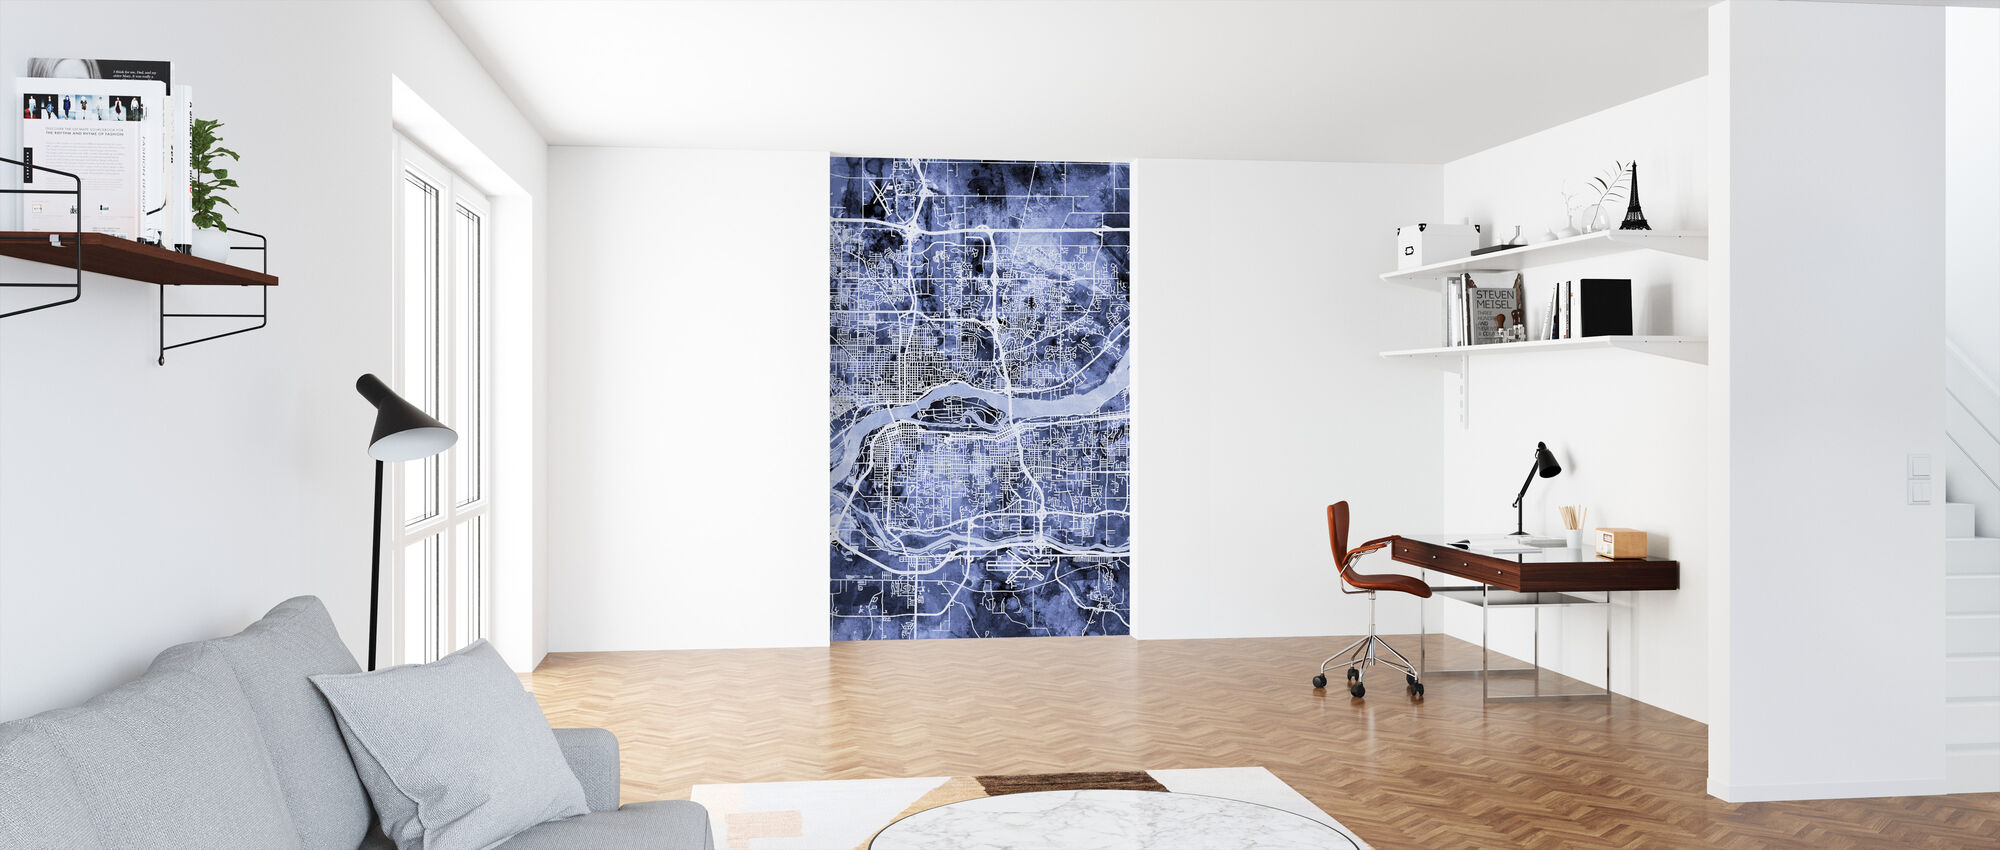 Quad Cities Mapa de la calle - Papel pintado - Oficina